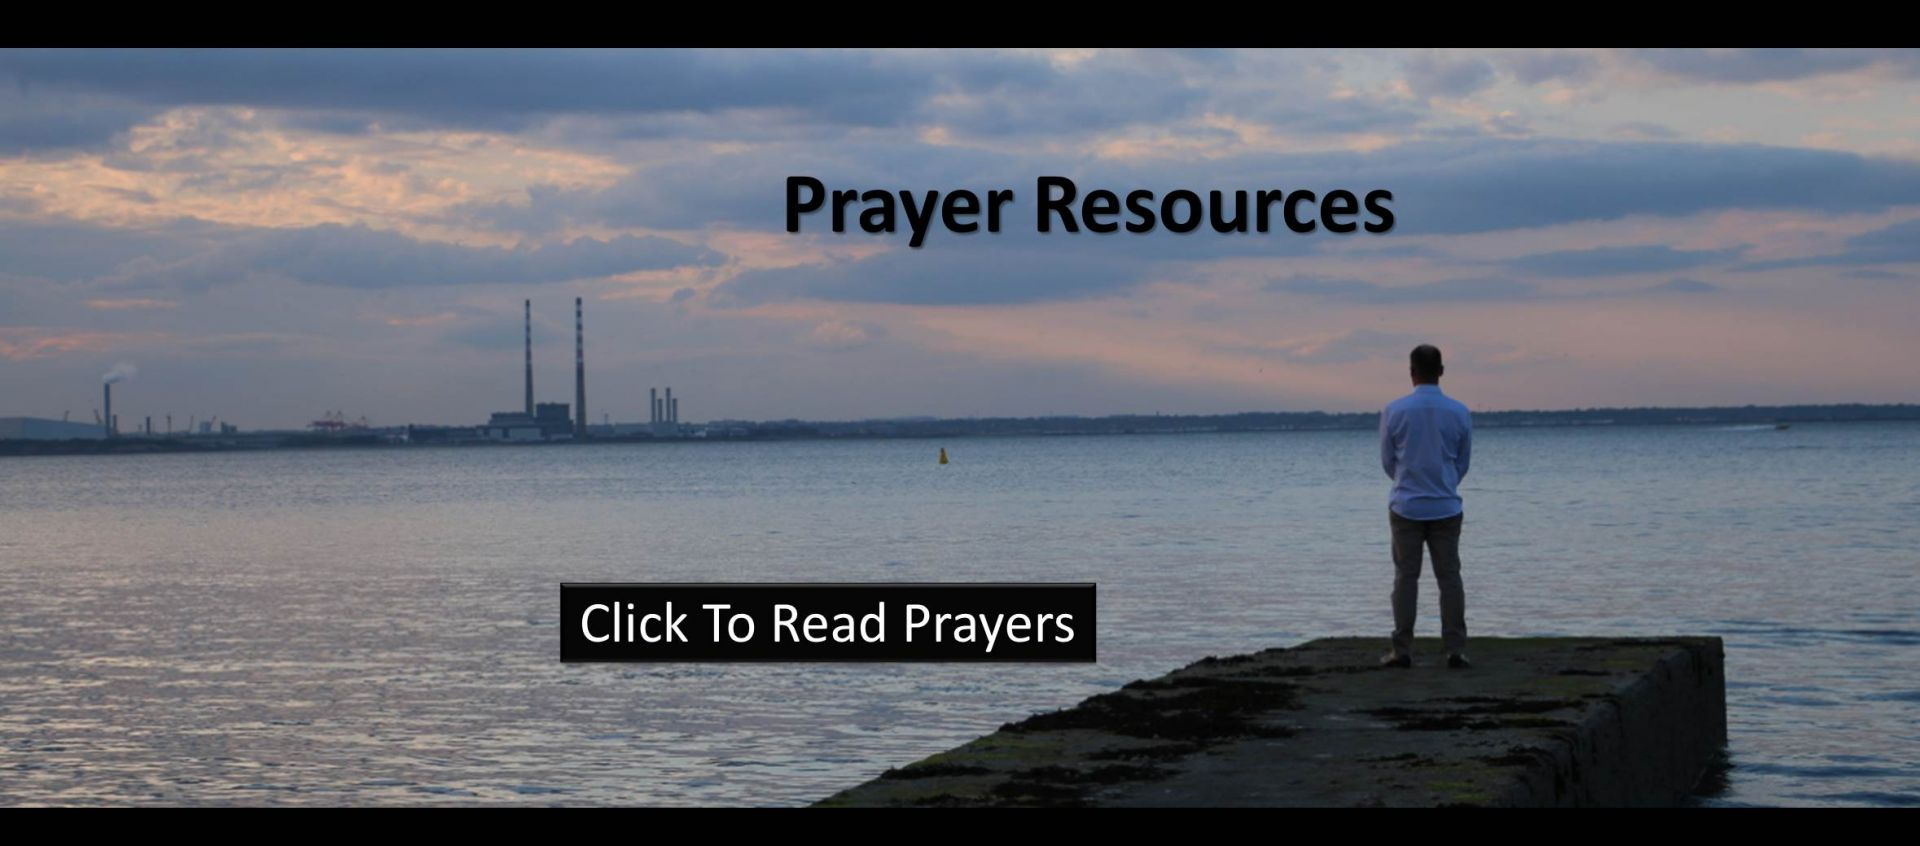 Additional Prayer Resources